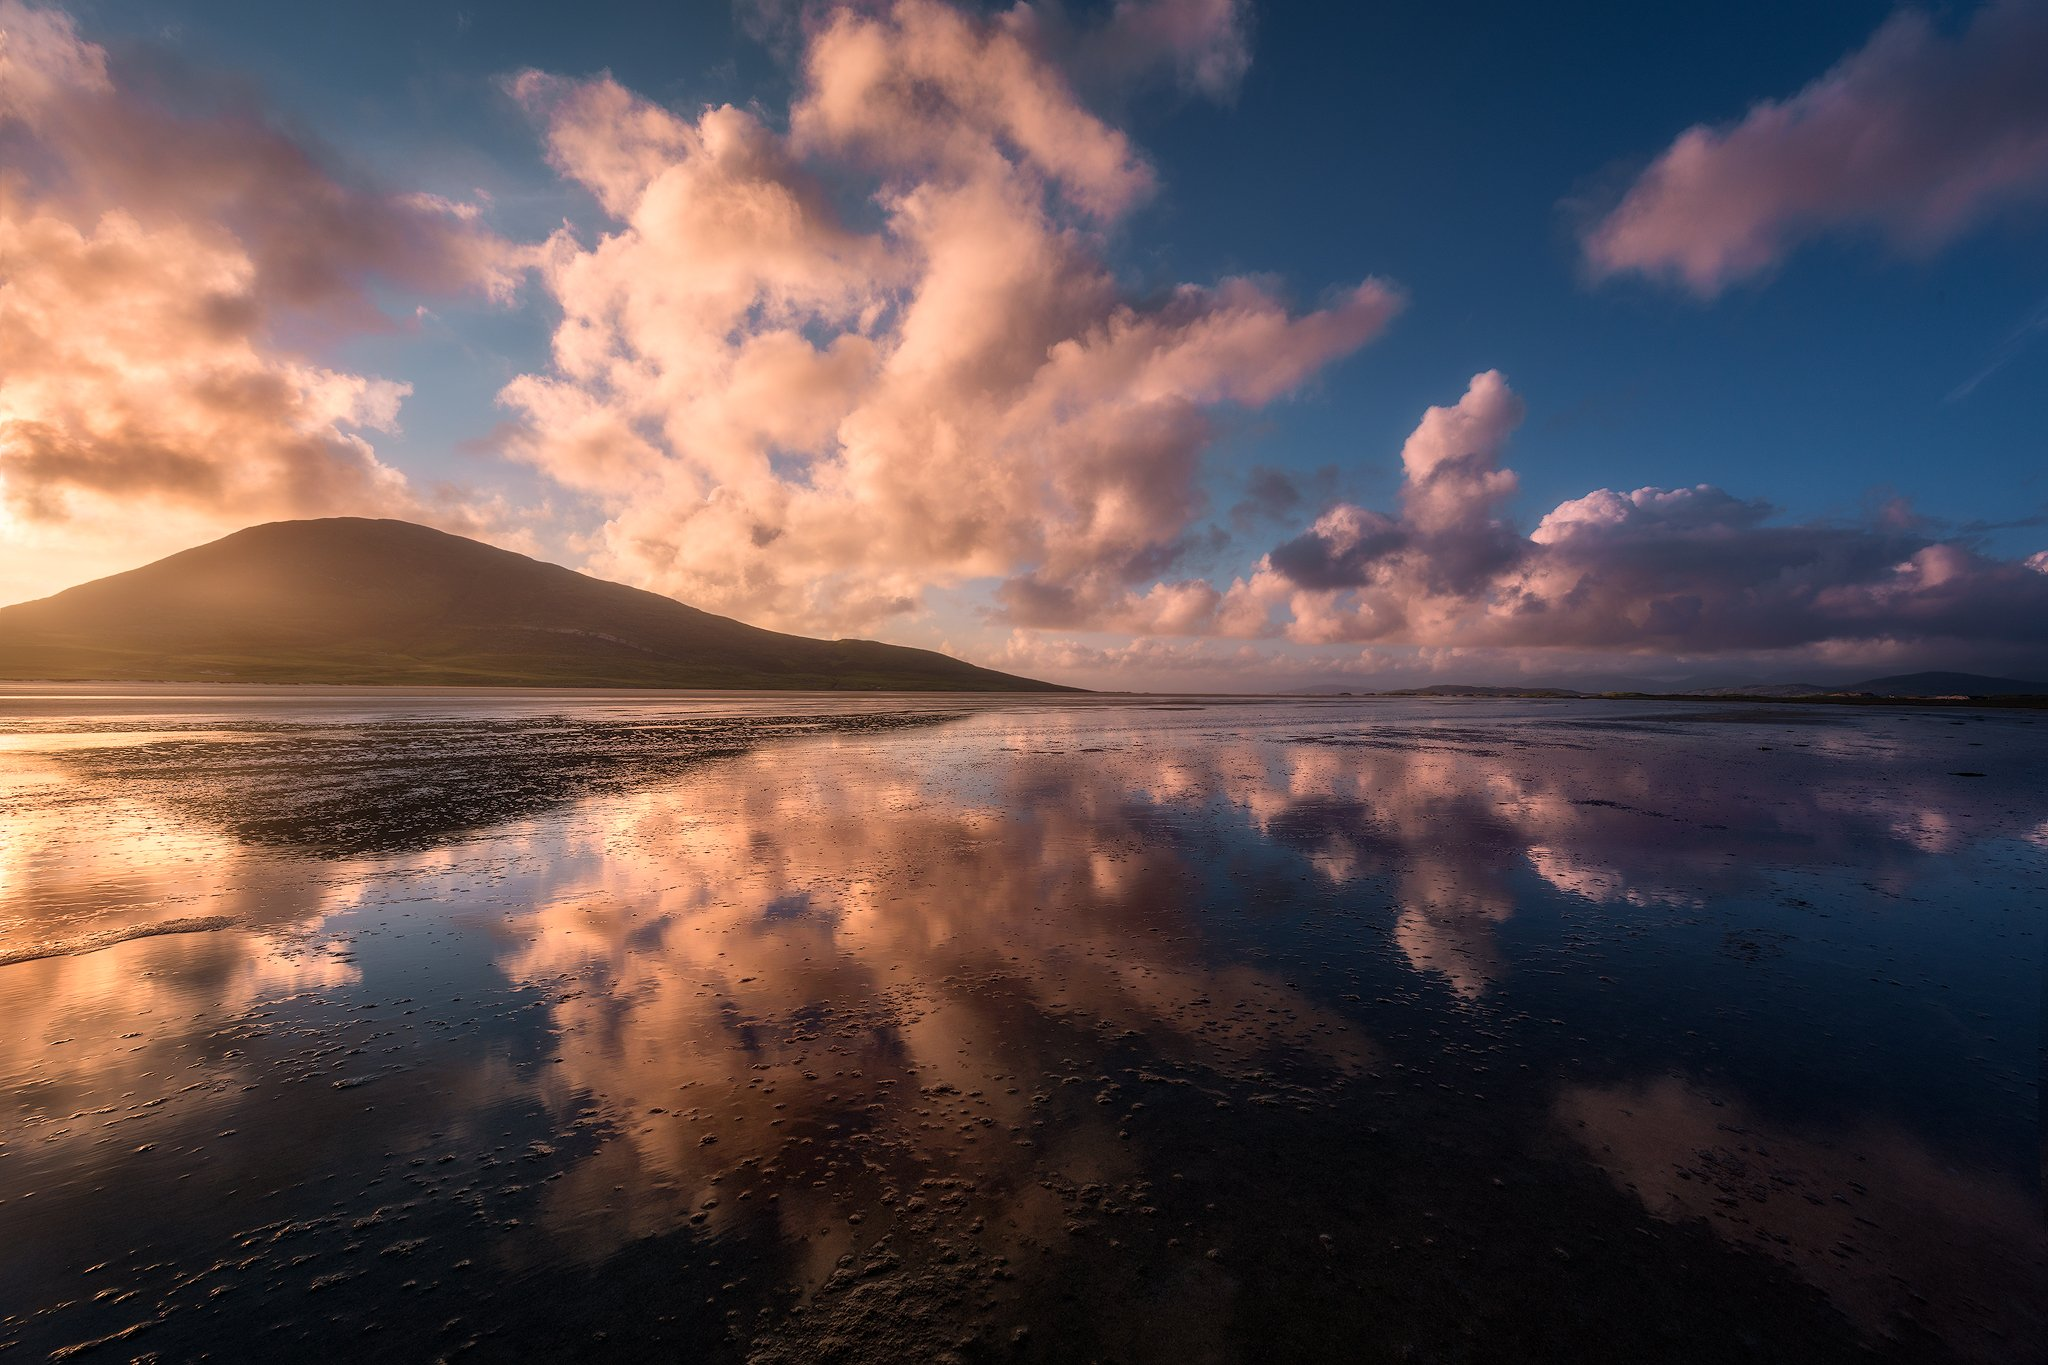 isle of harris hebrides scotland sky clouds reflection sescape light mood colors, Maciej Warchoł